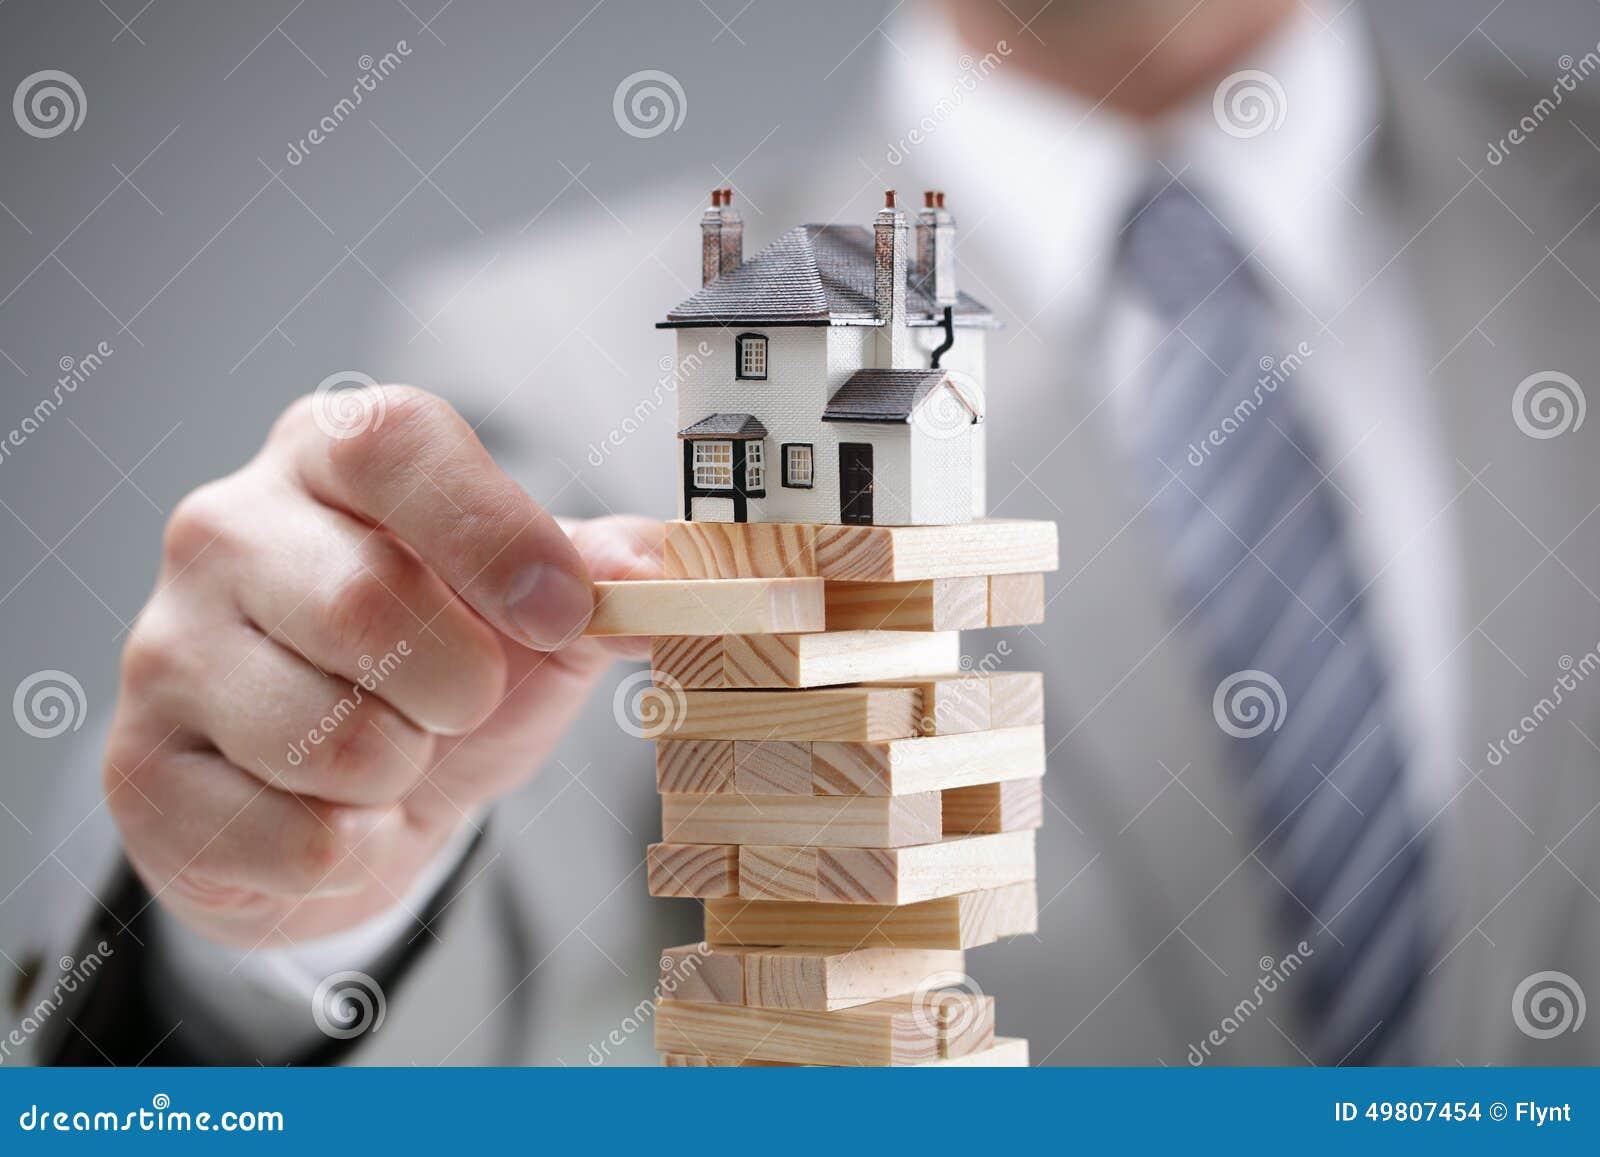 Риск рынка недвижимости